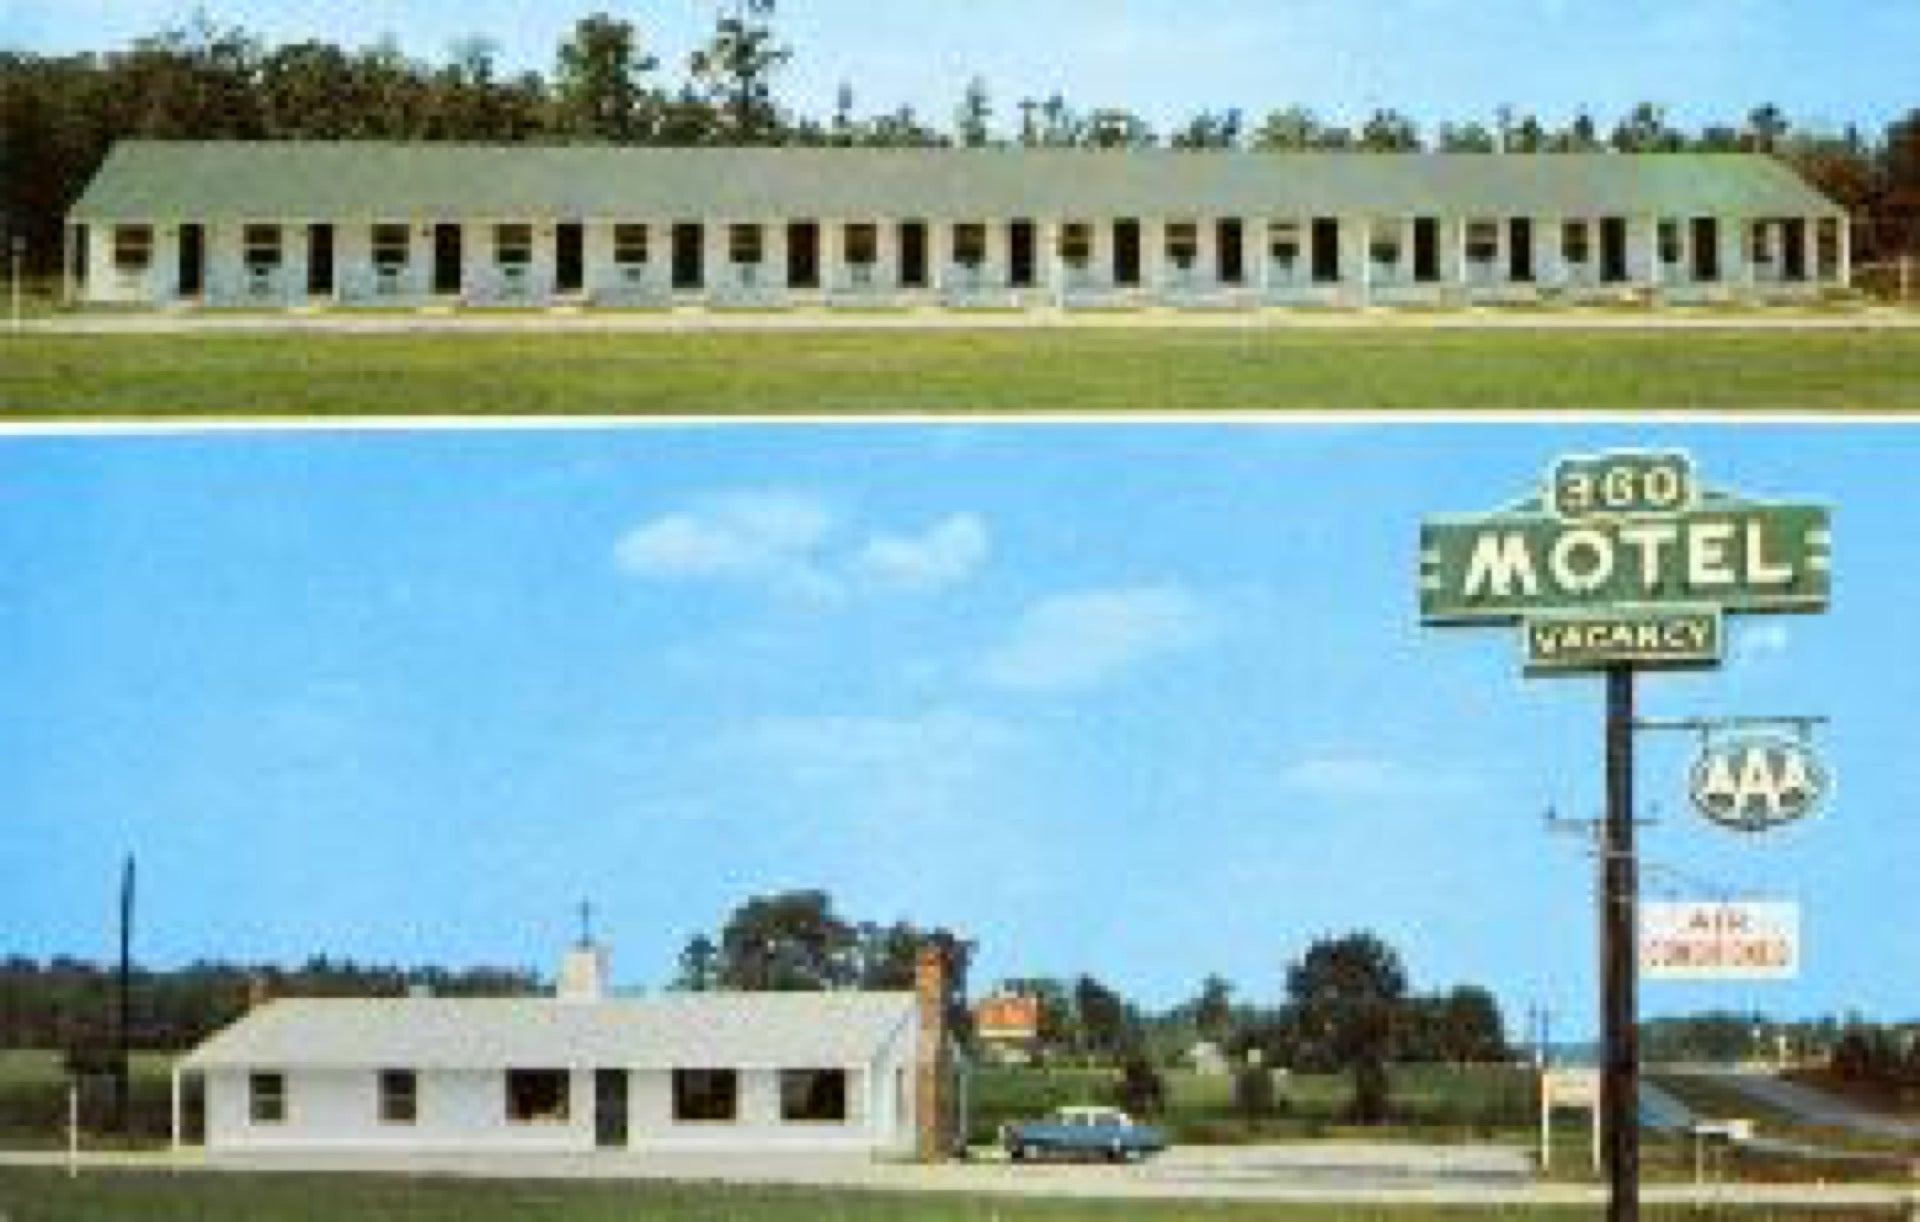 360 Motel,